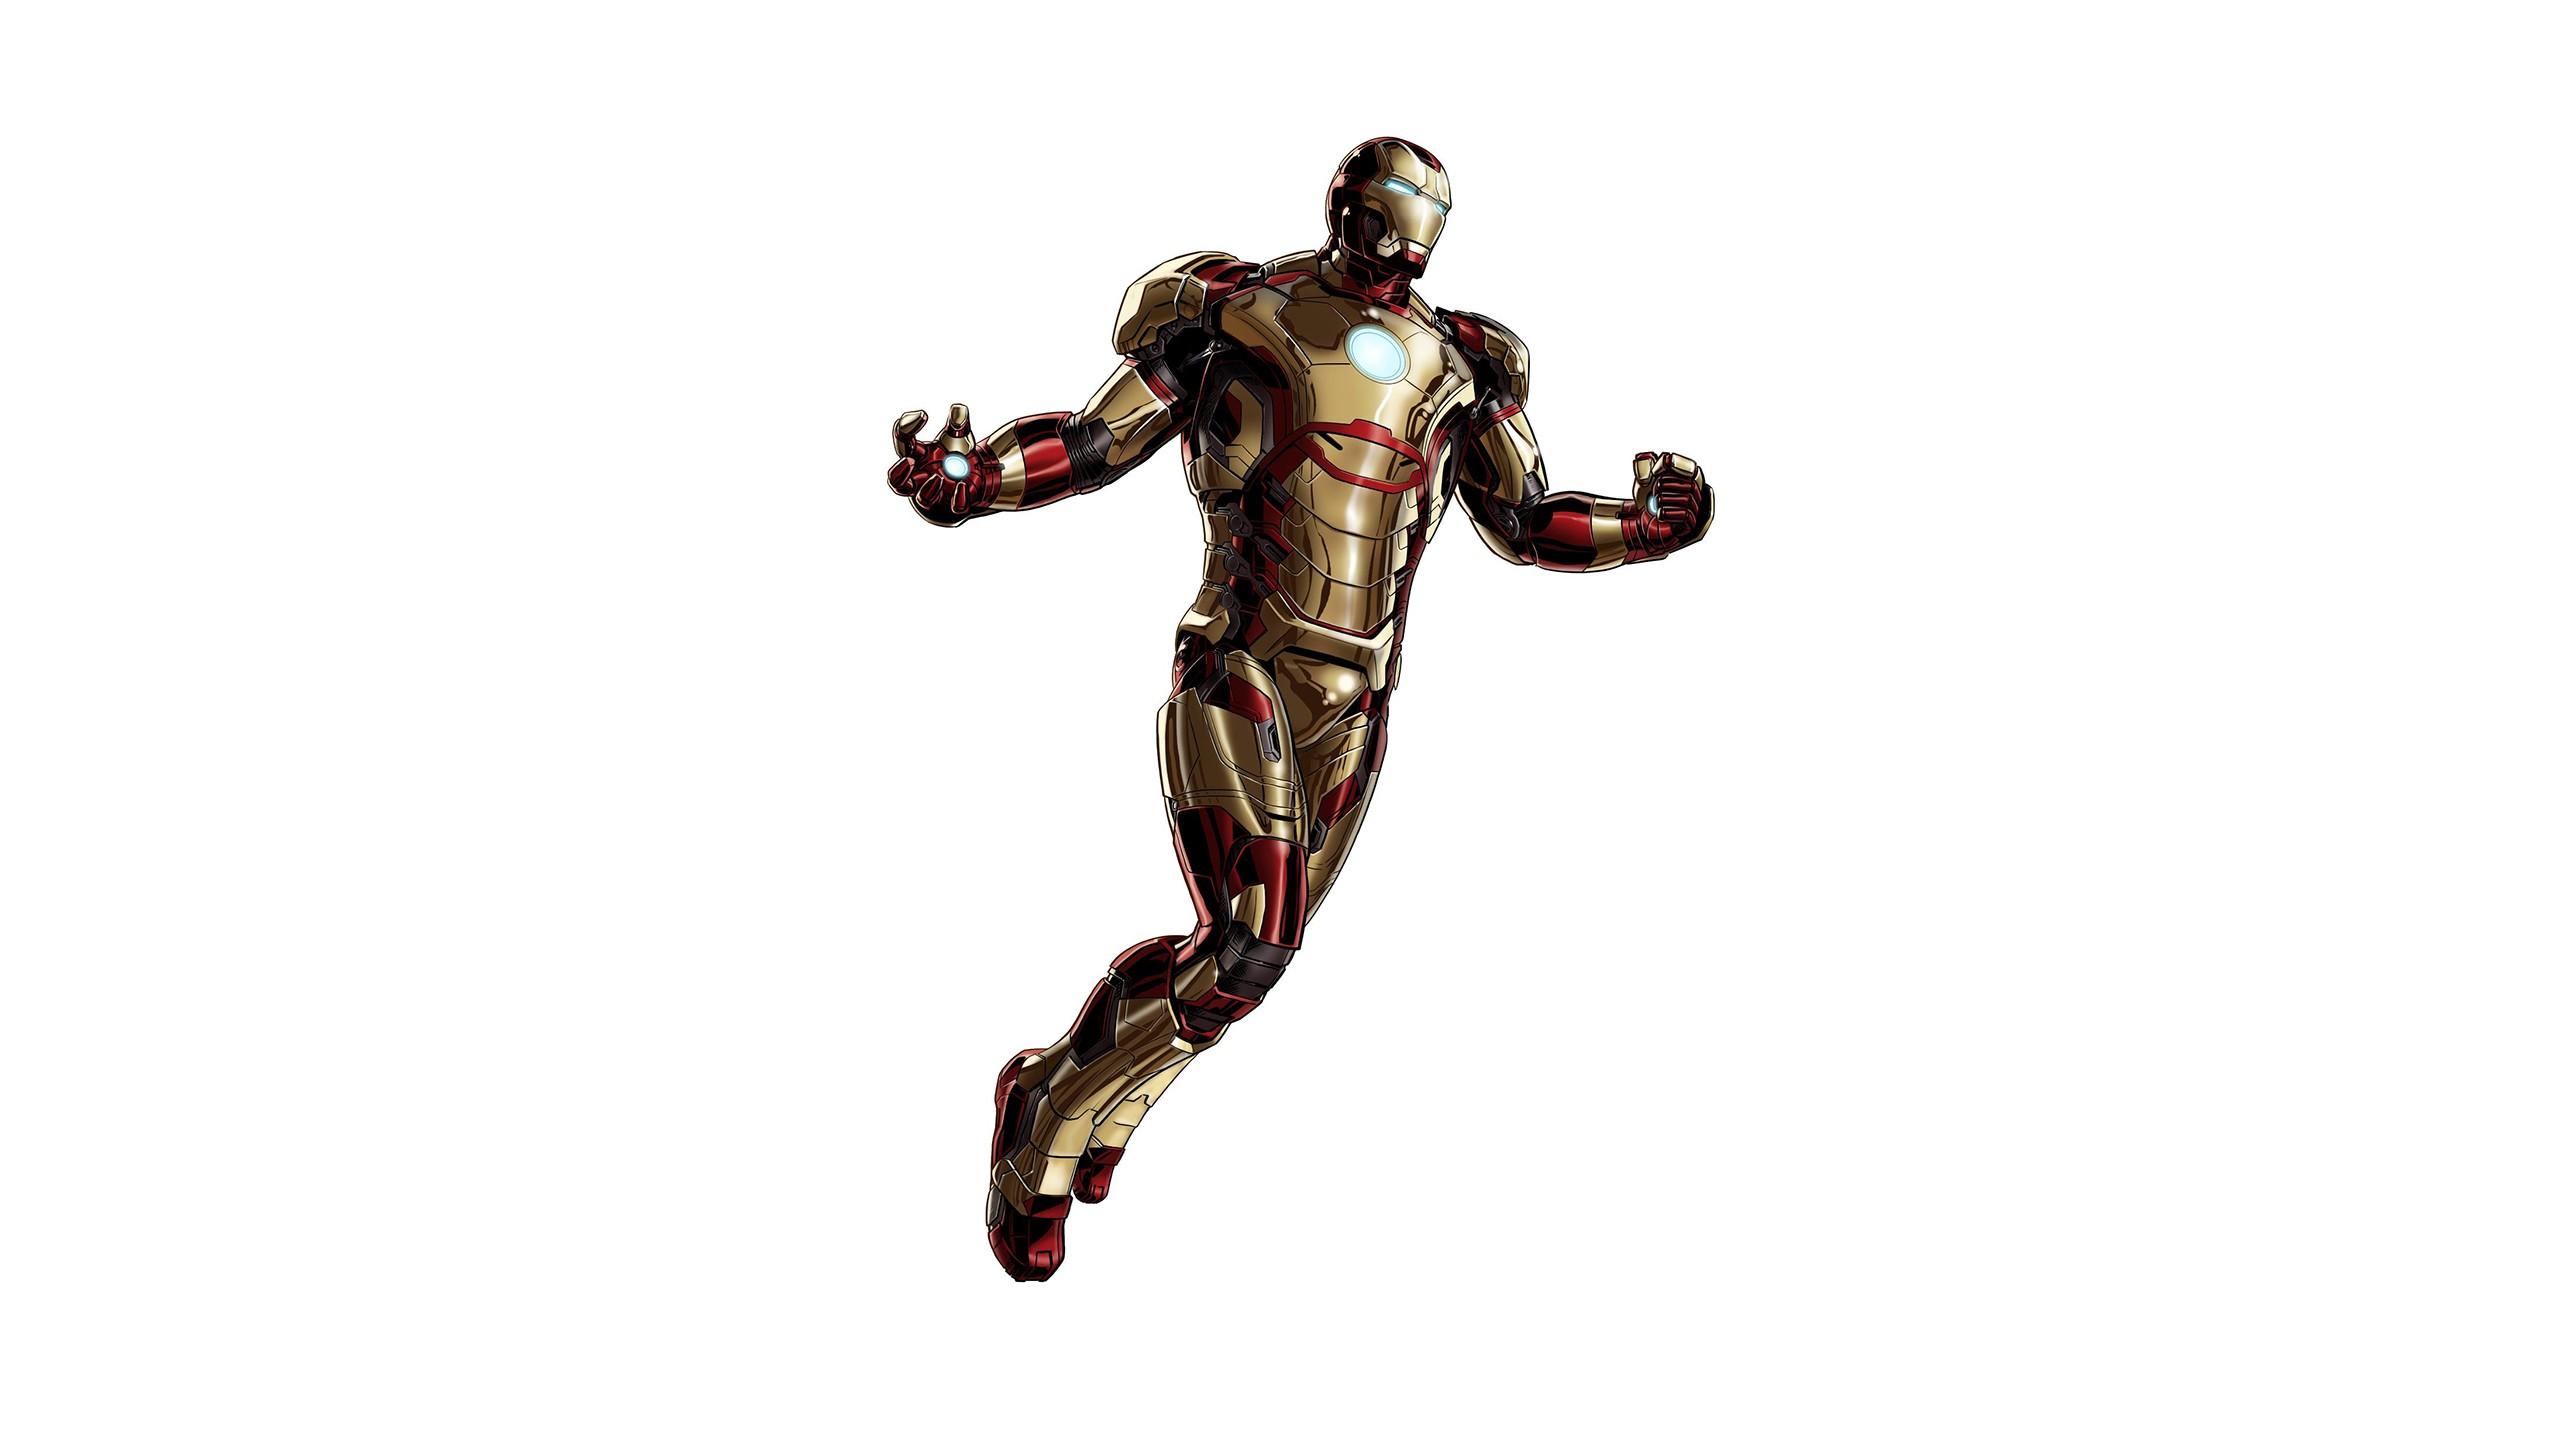 Iron Man White Comics Movies Superhero Wallpaper 2560x1440 83153 Wallpaperup